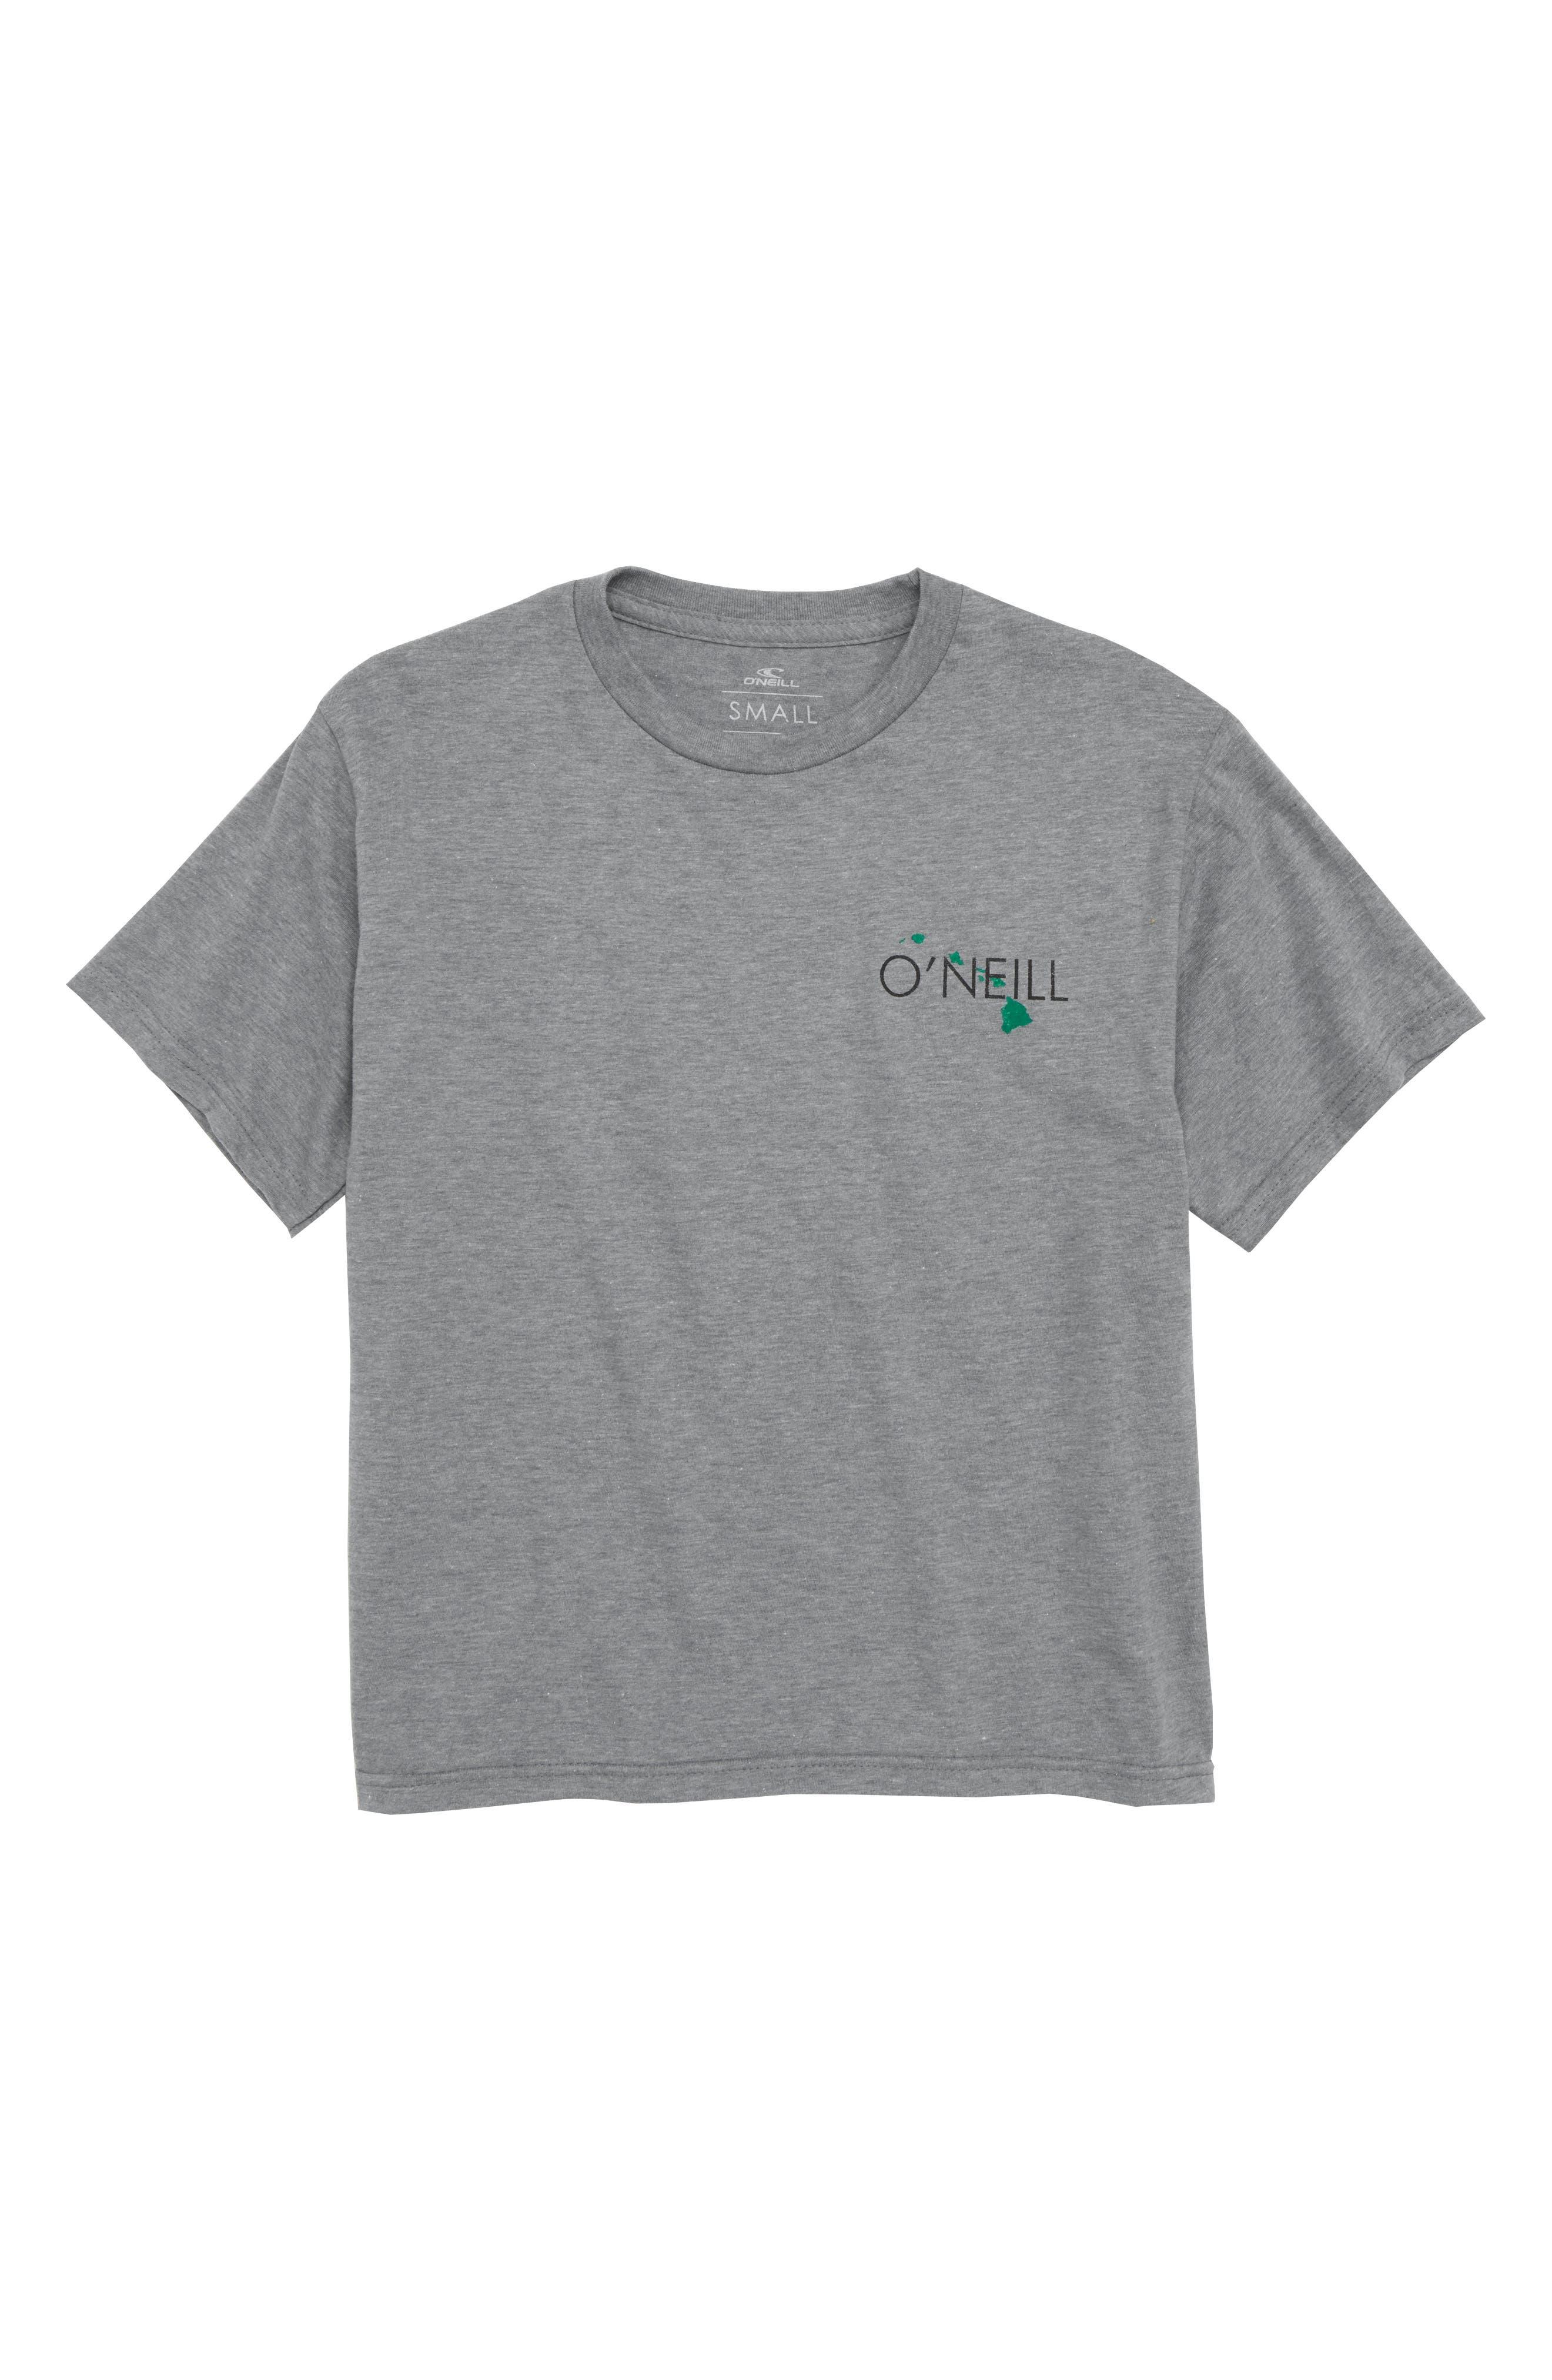 State of Aloha T-Shirt,                             Main thumbnail 1, color,                             Medium Heather Grey